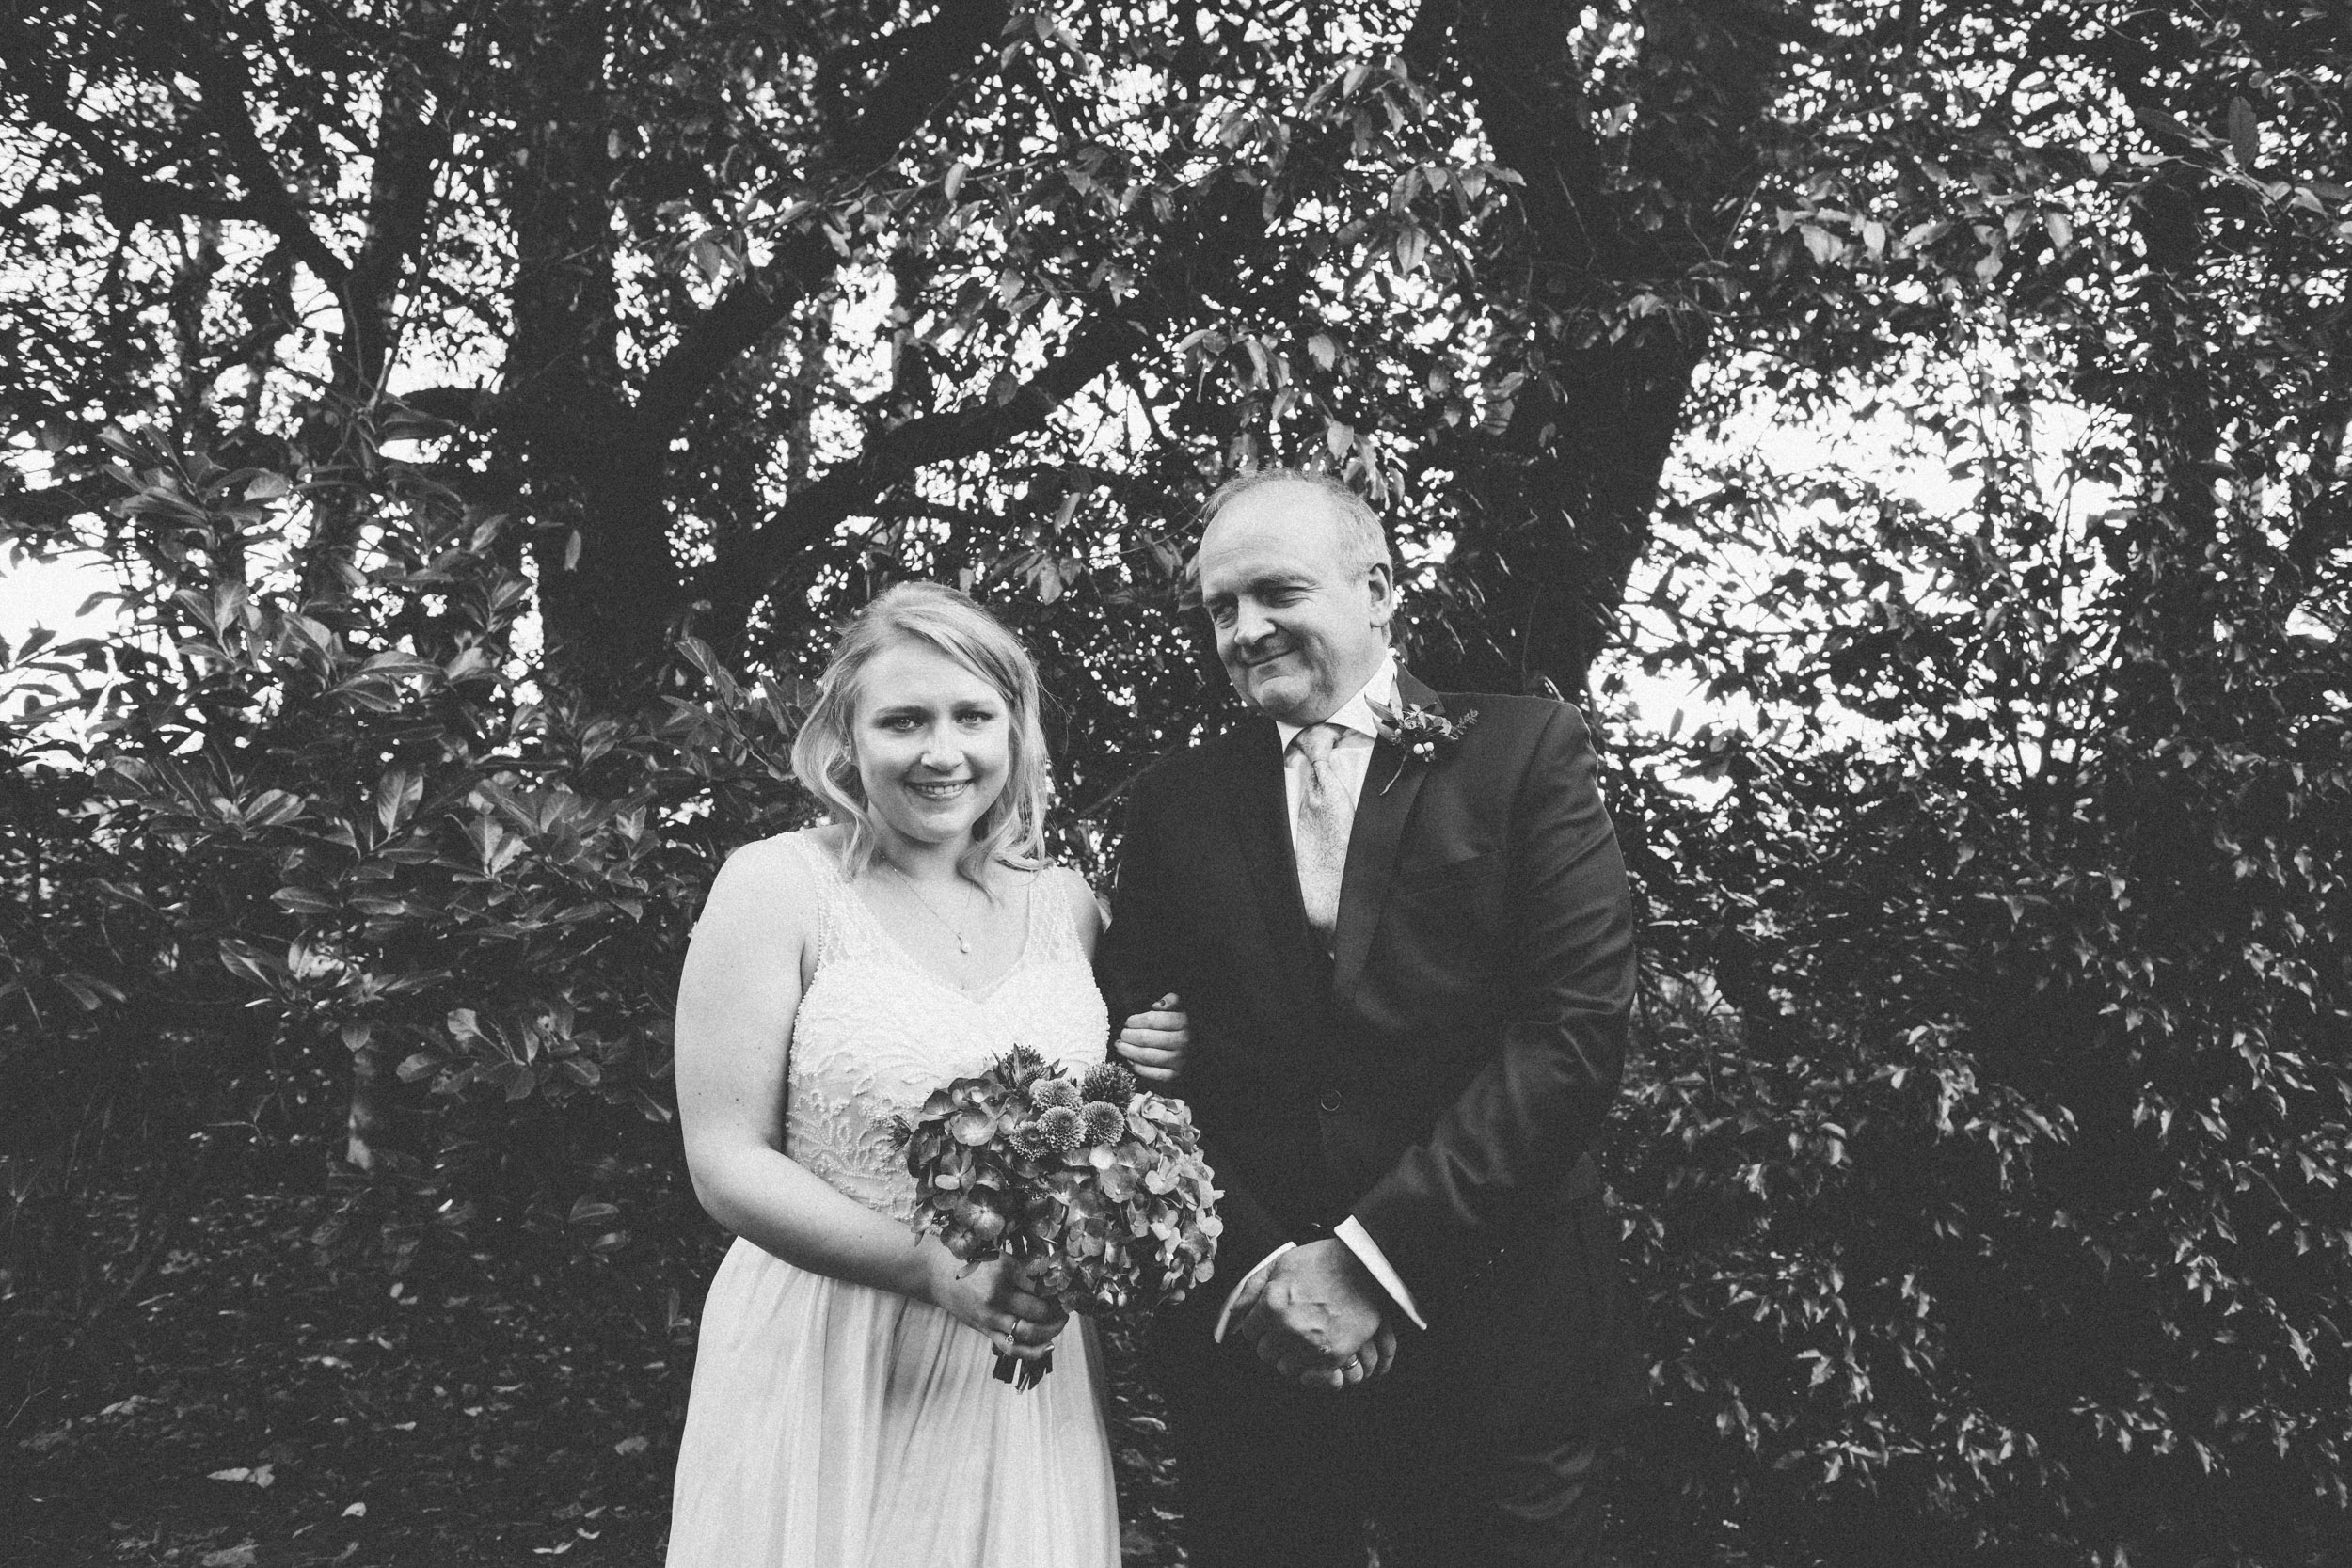 Quirky Wedding Photographer Edinburgh Jupiter Artland -9.jpg